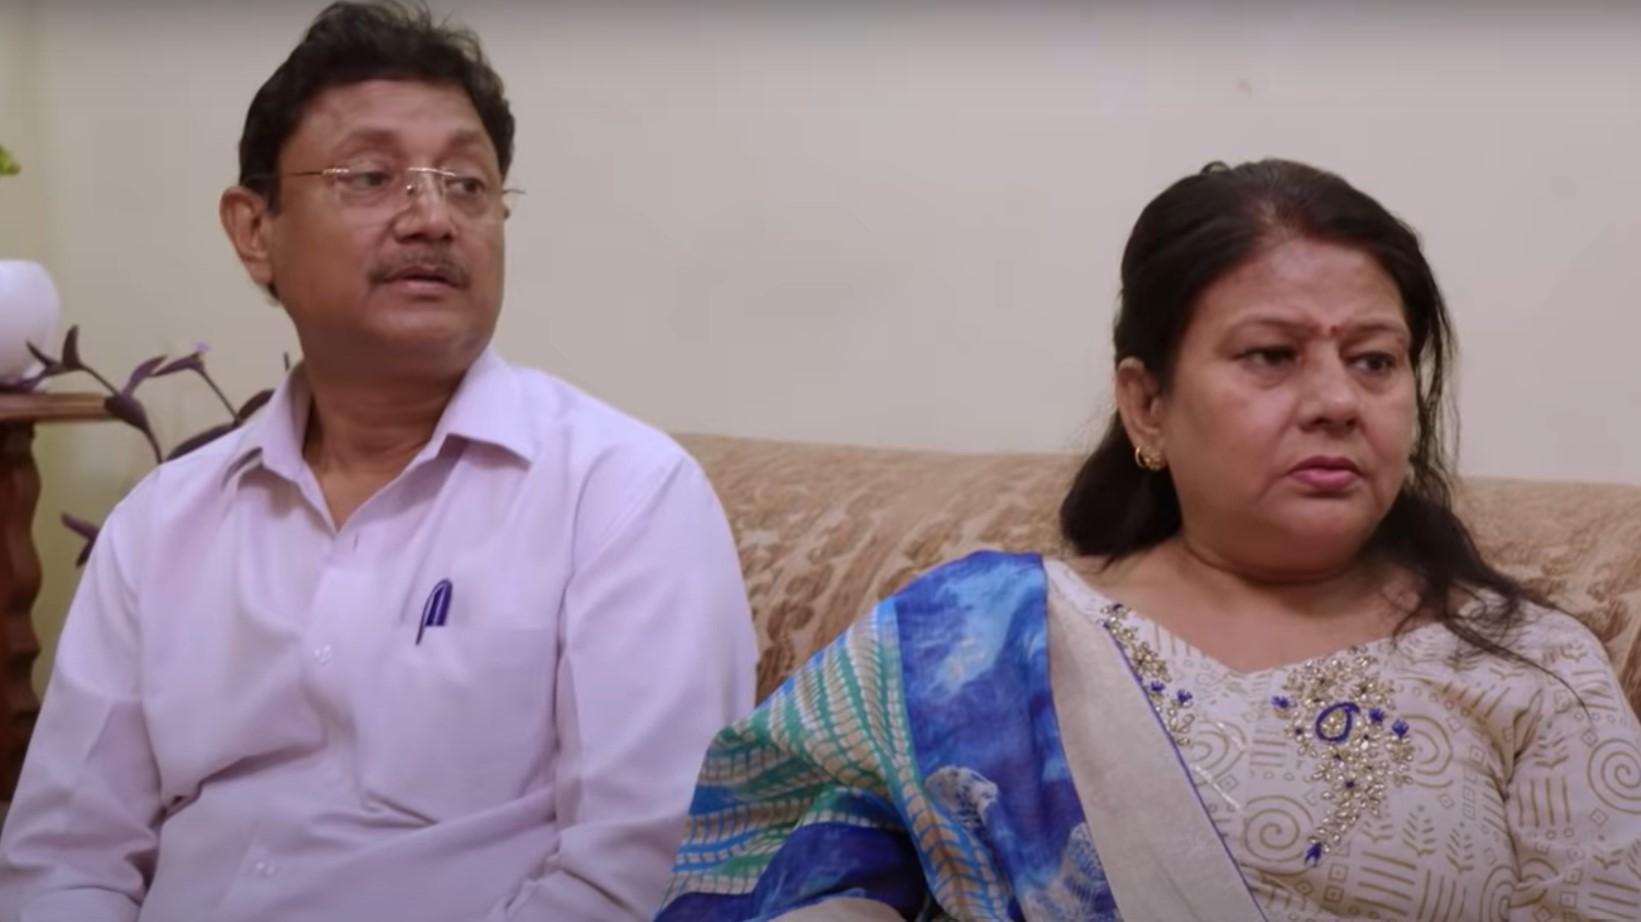 Sumit's parents on '90 Day Fiancé'